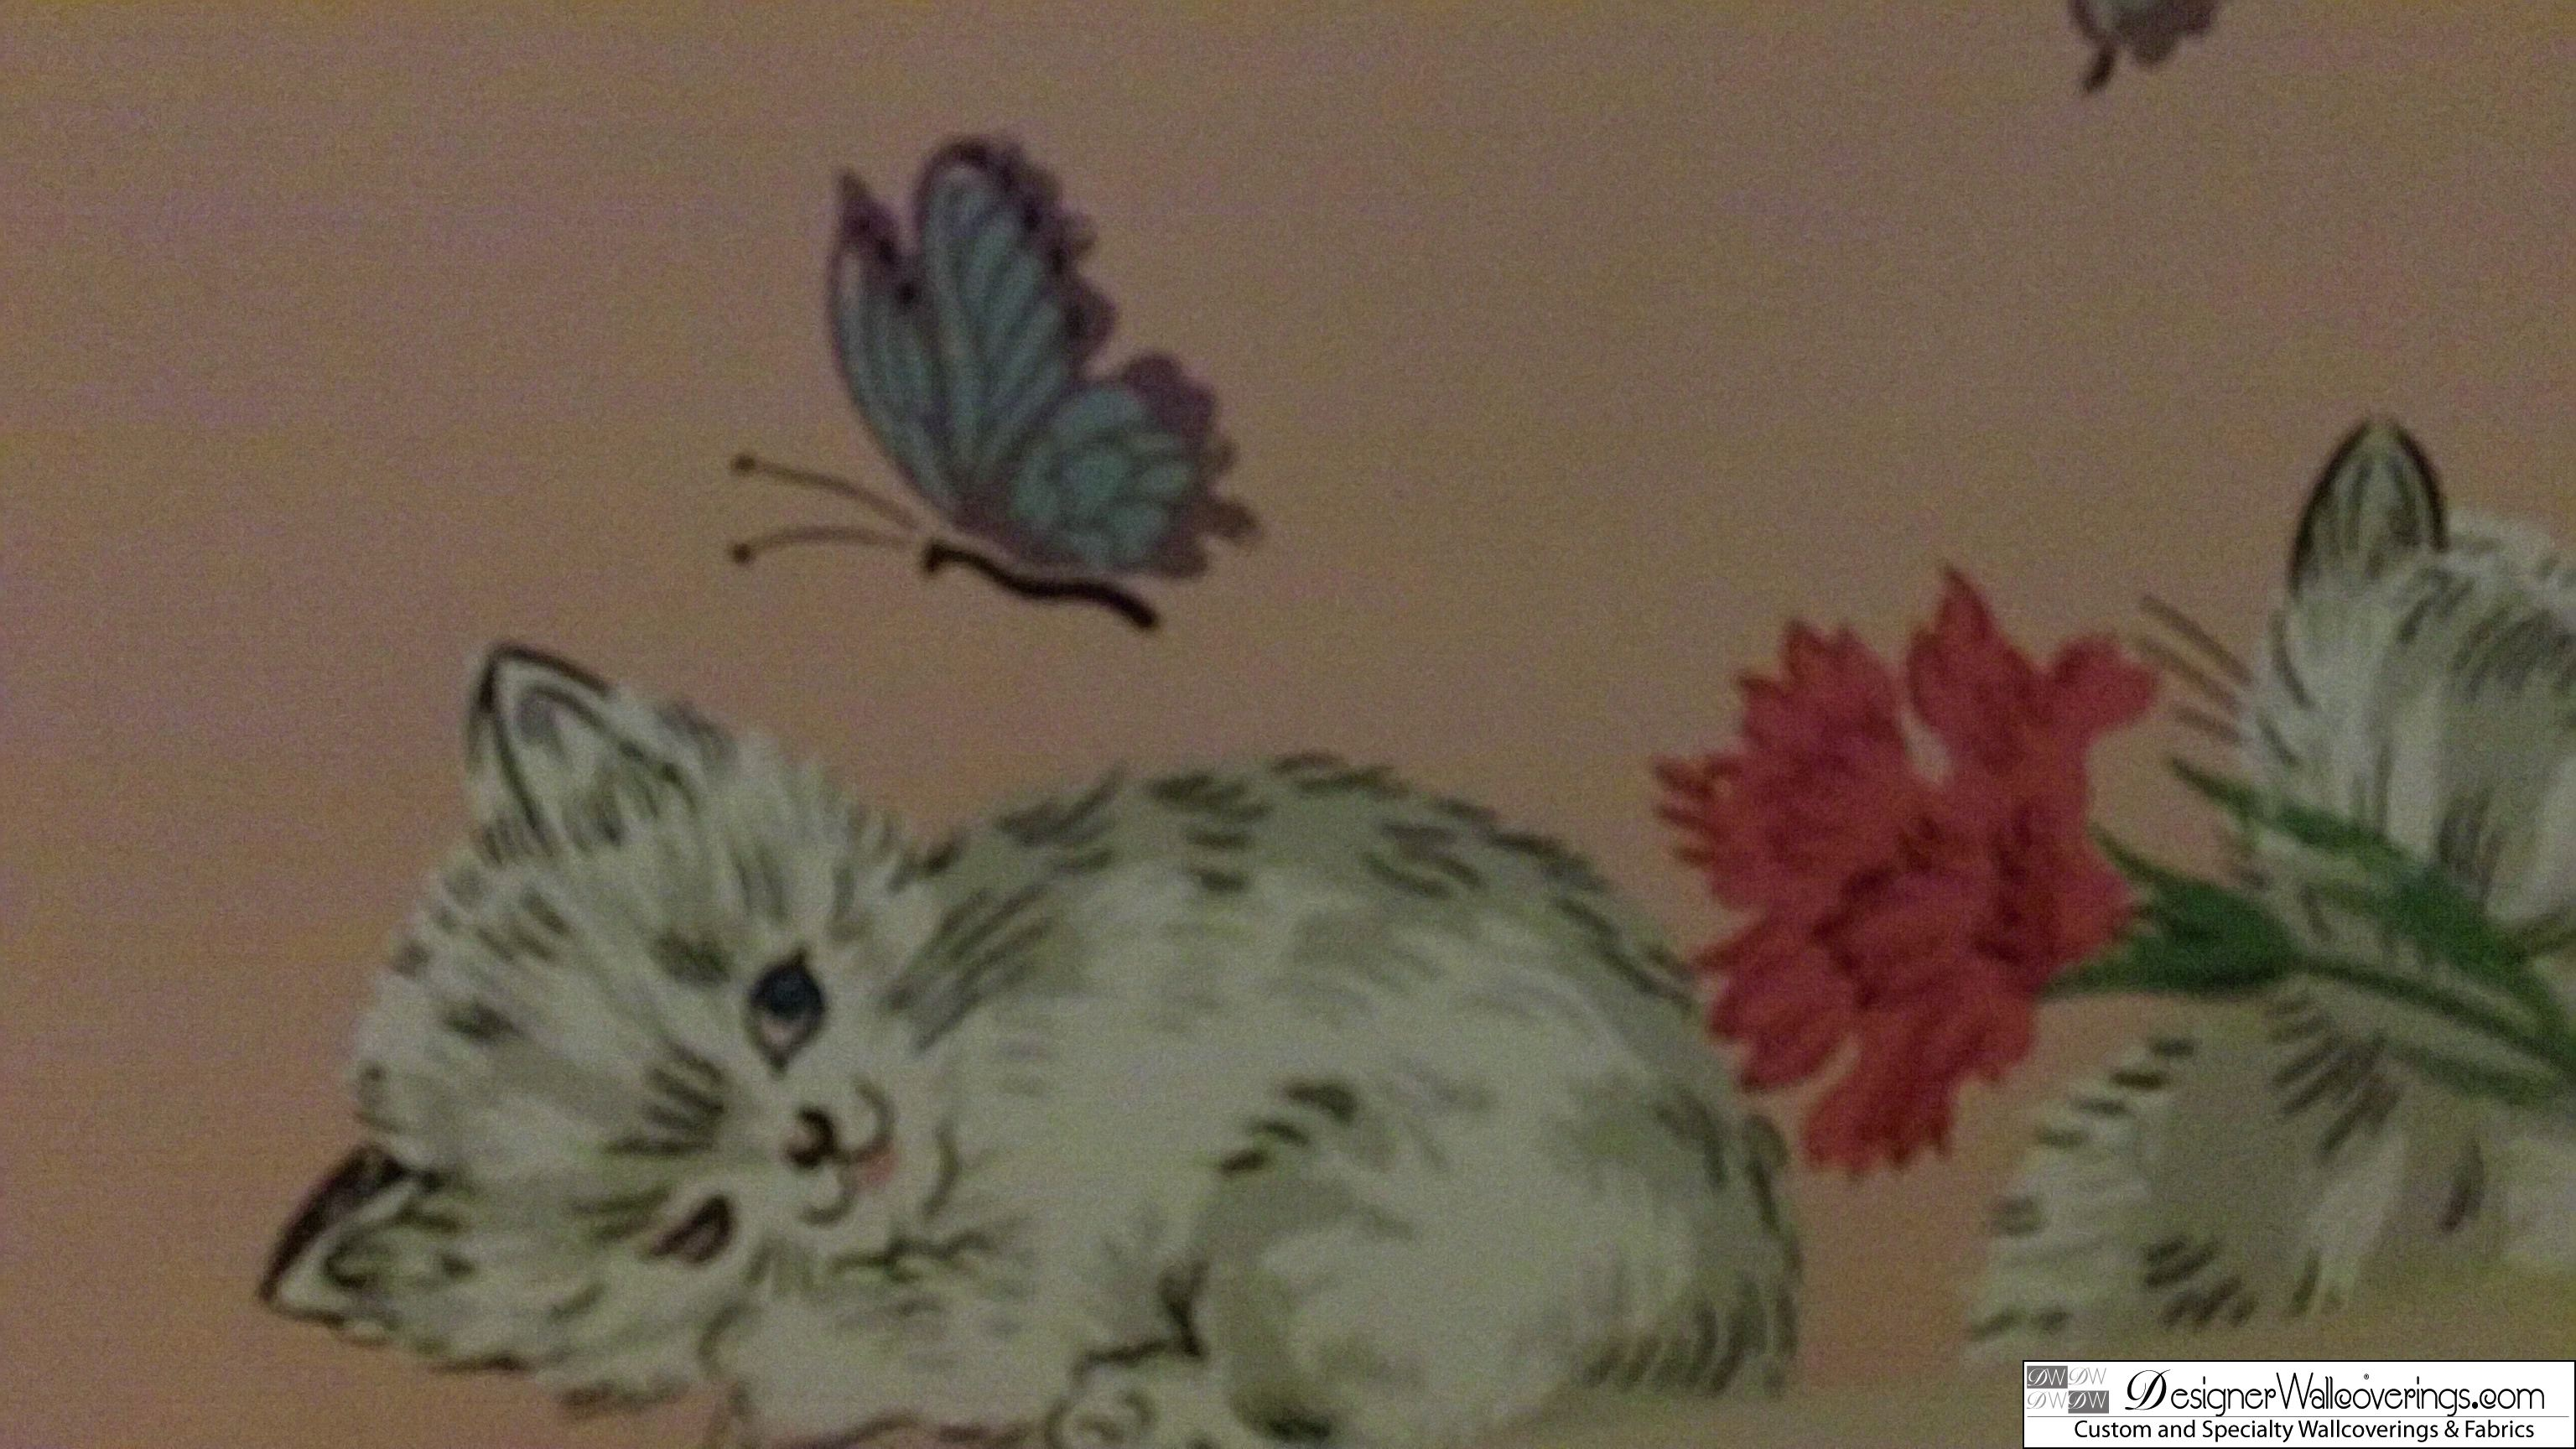 Vintage Kittens and Butterflies [DIG 15008] Designer Wallcoverings 3072x1728